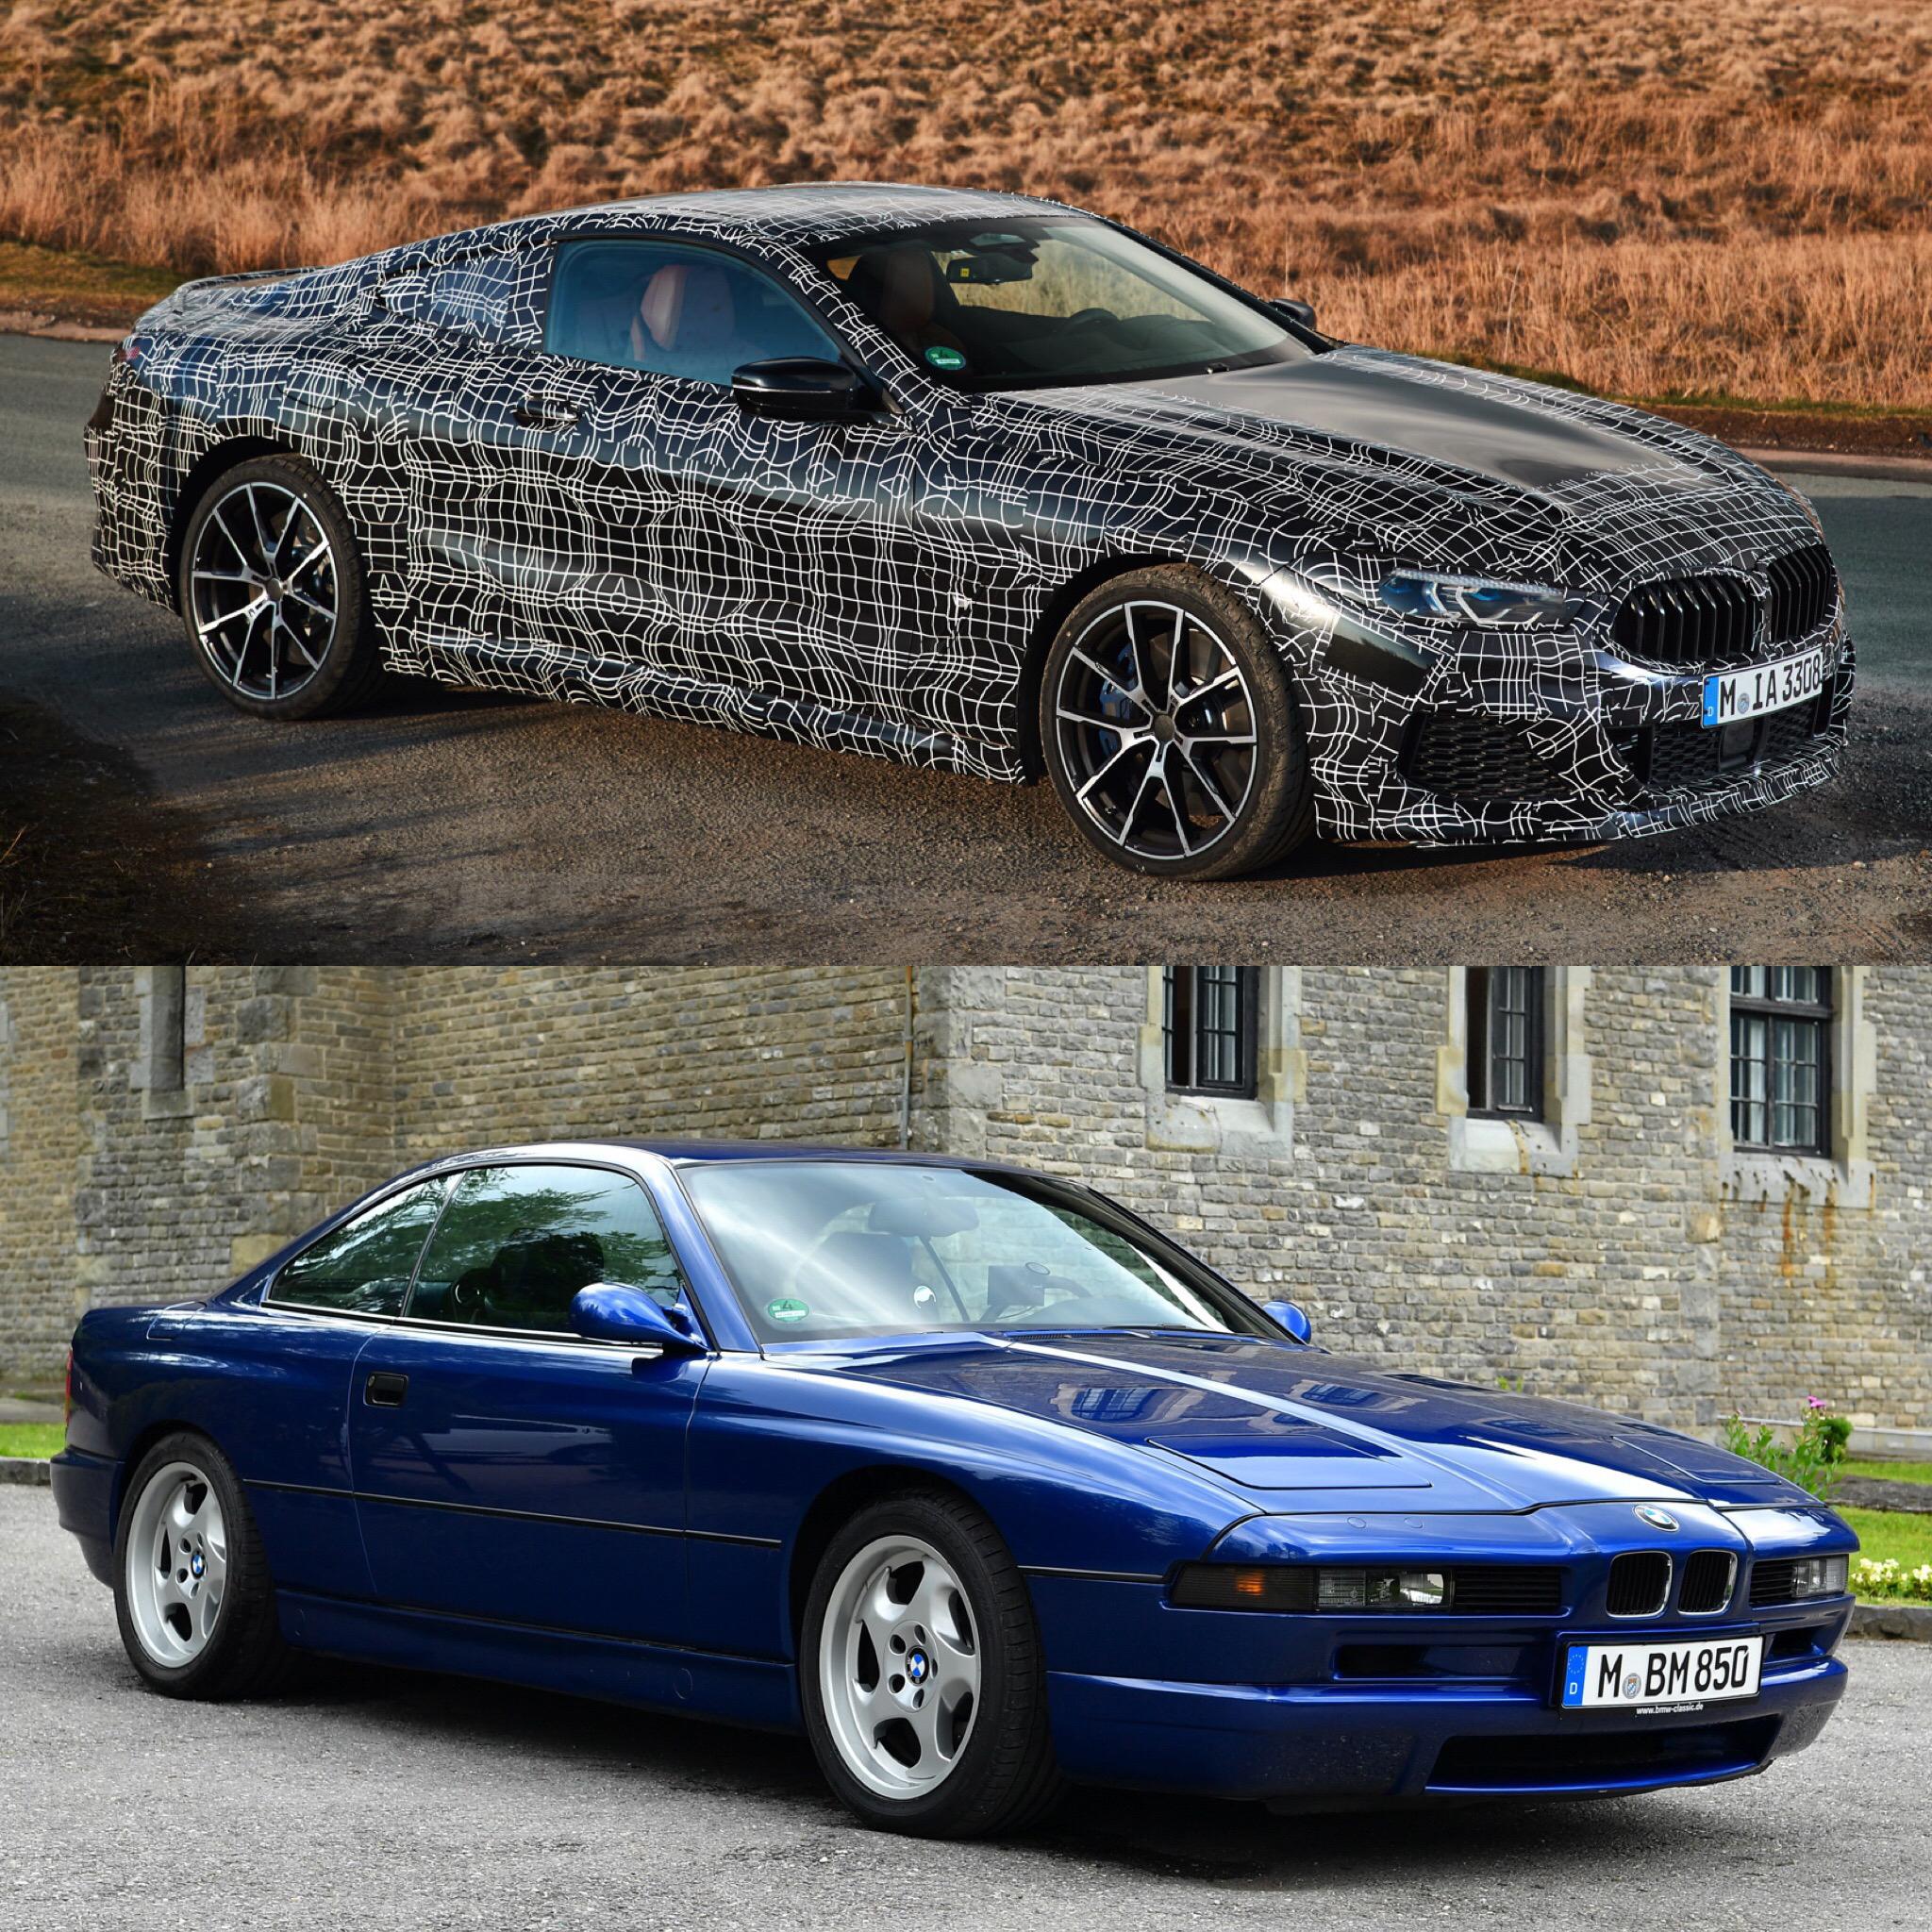 Photo Comparison: G15 BMW 8 Series Vs E31 BMW 8 Series